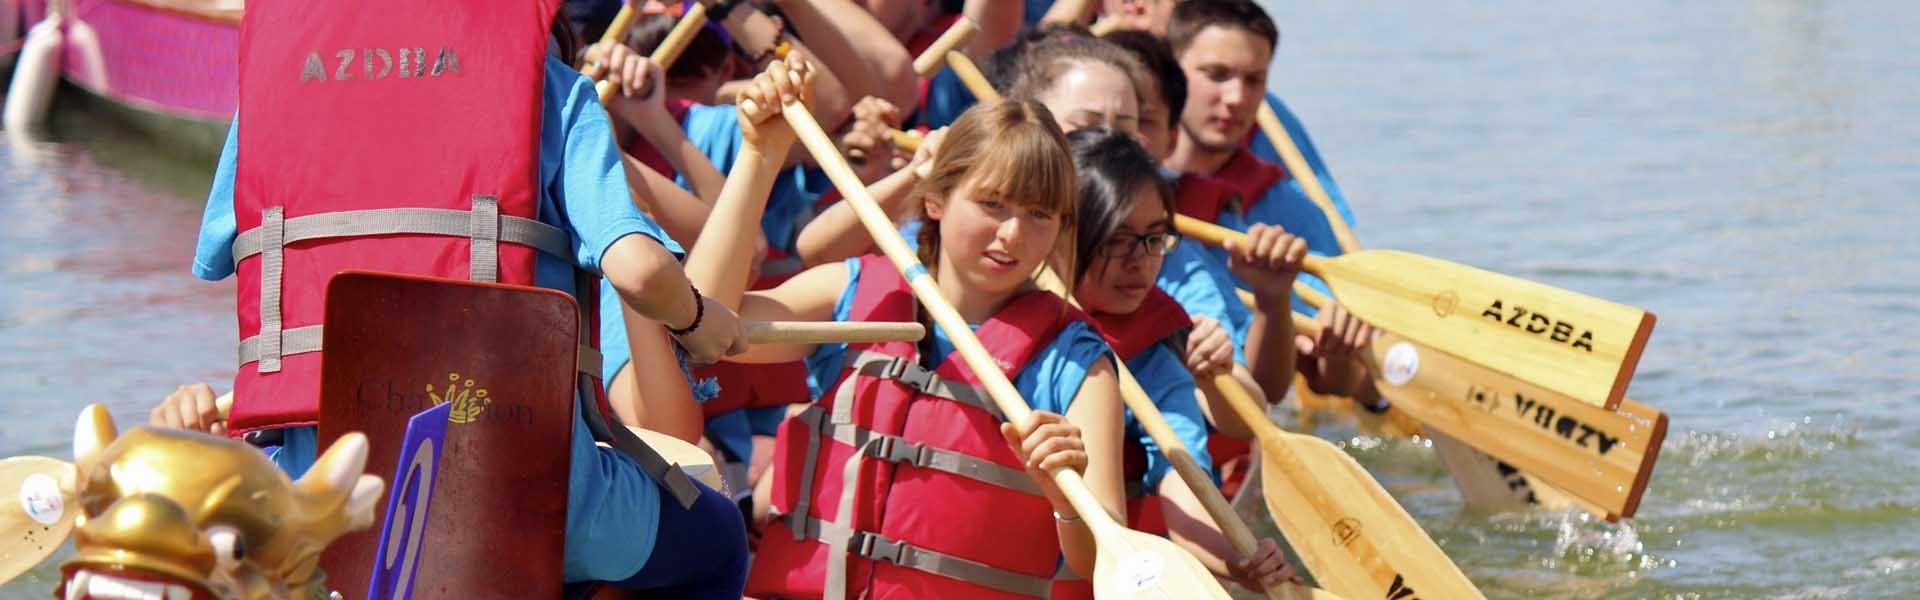 RanchoSolanoPreparatorySchool-Highschool-Arizona-Rowing-main-banner-2019